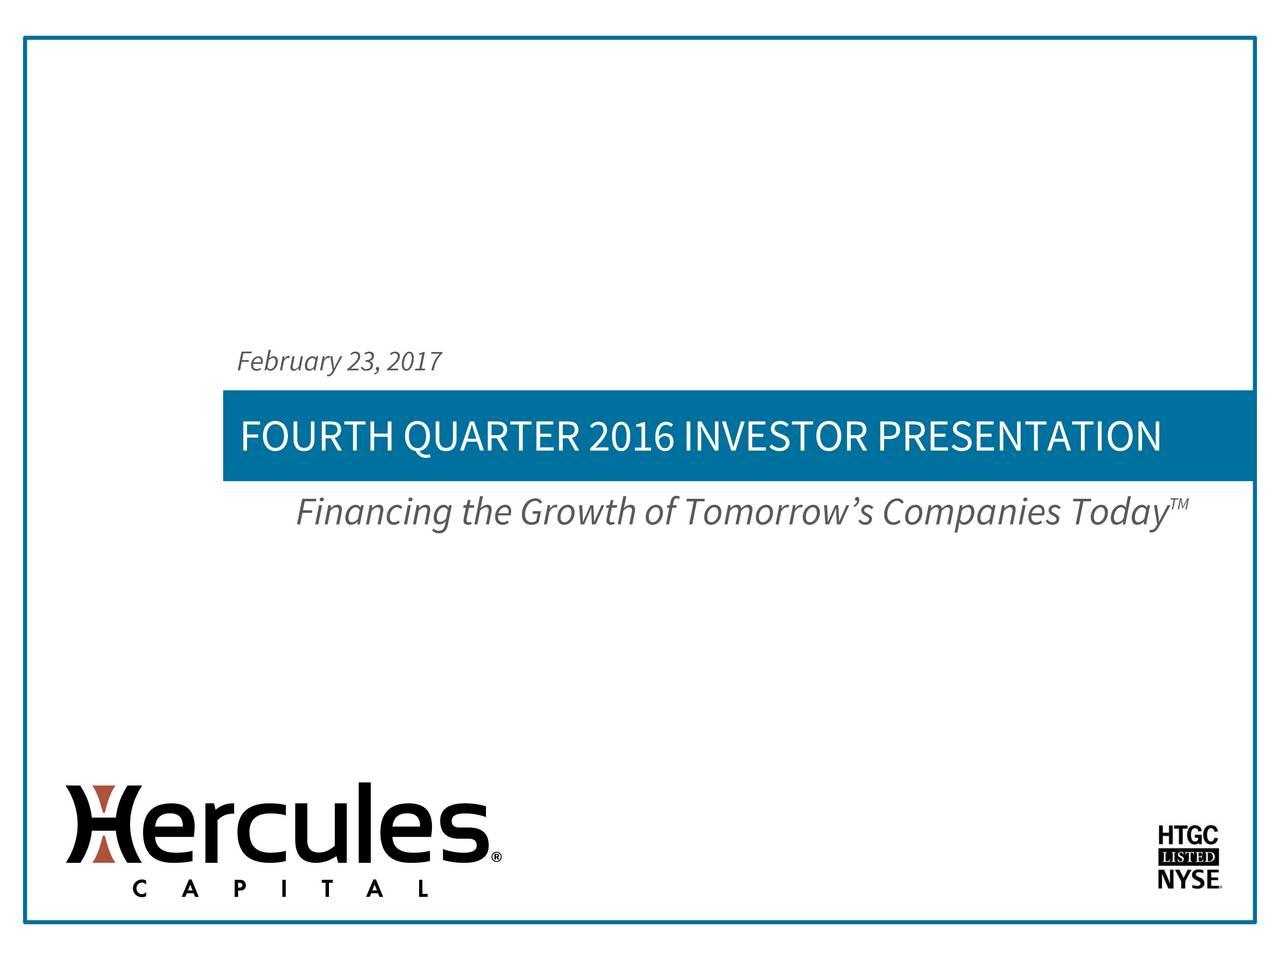 FOURTHQUARTER2016INVESTORPRESENTATION FinancingtheGrowthofTomorrowsCompanies Today TM